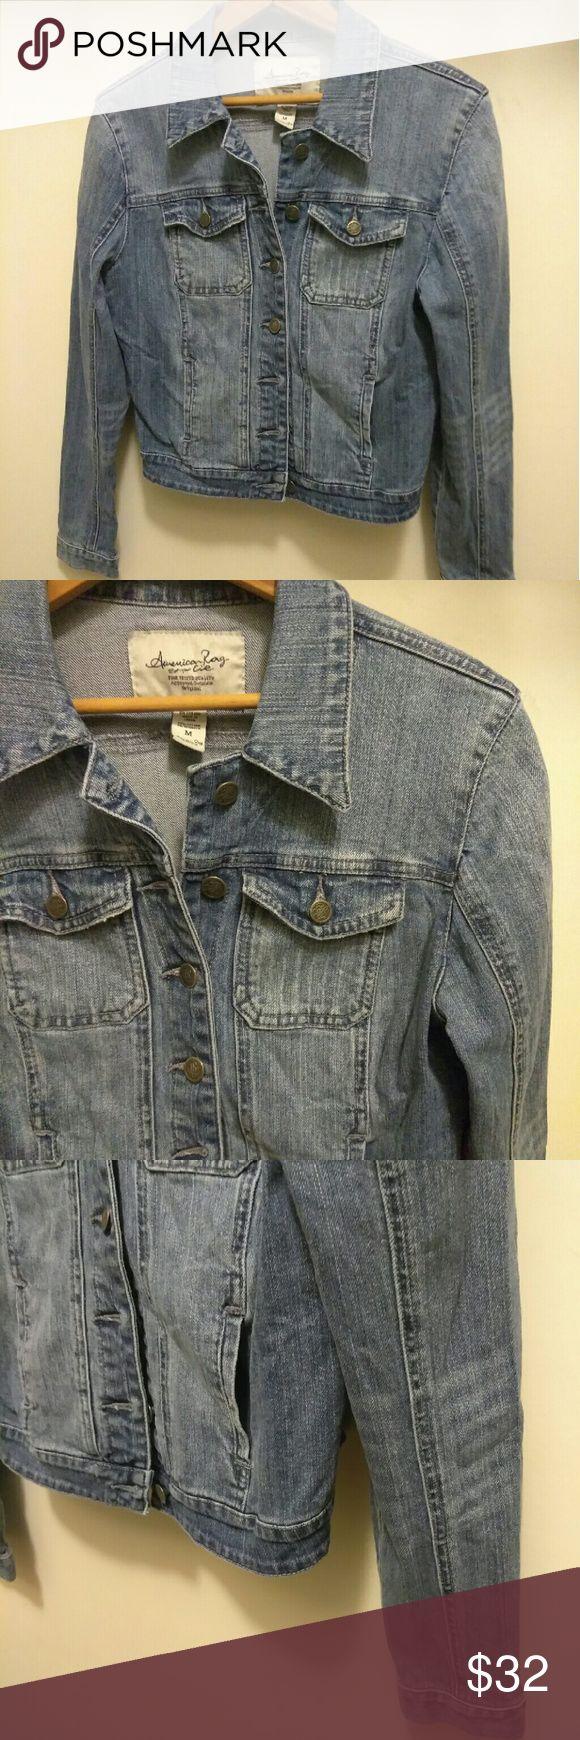 💙NWOT American Rag Jean Jacket Sz M💙 💙NWOT American Rag Jean Jacket Sz M💙 American Rag Jackets & Coats Jean Jackets